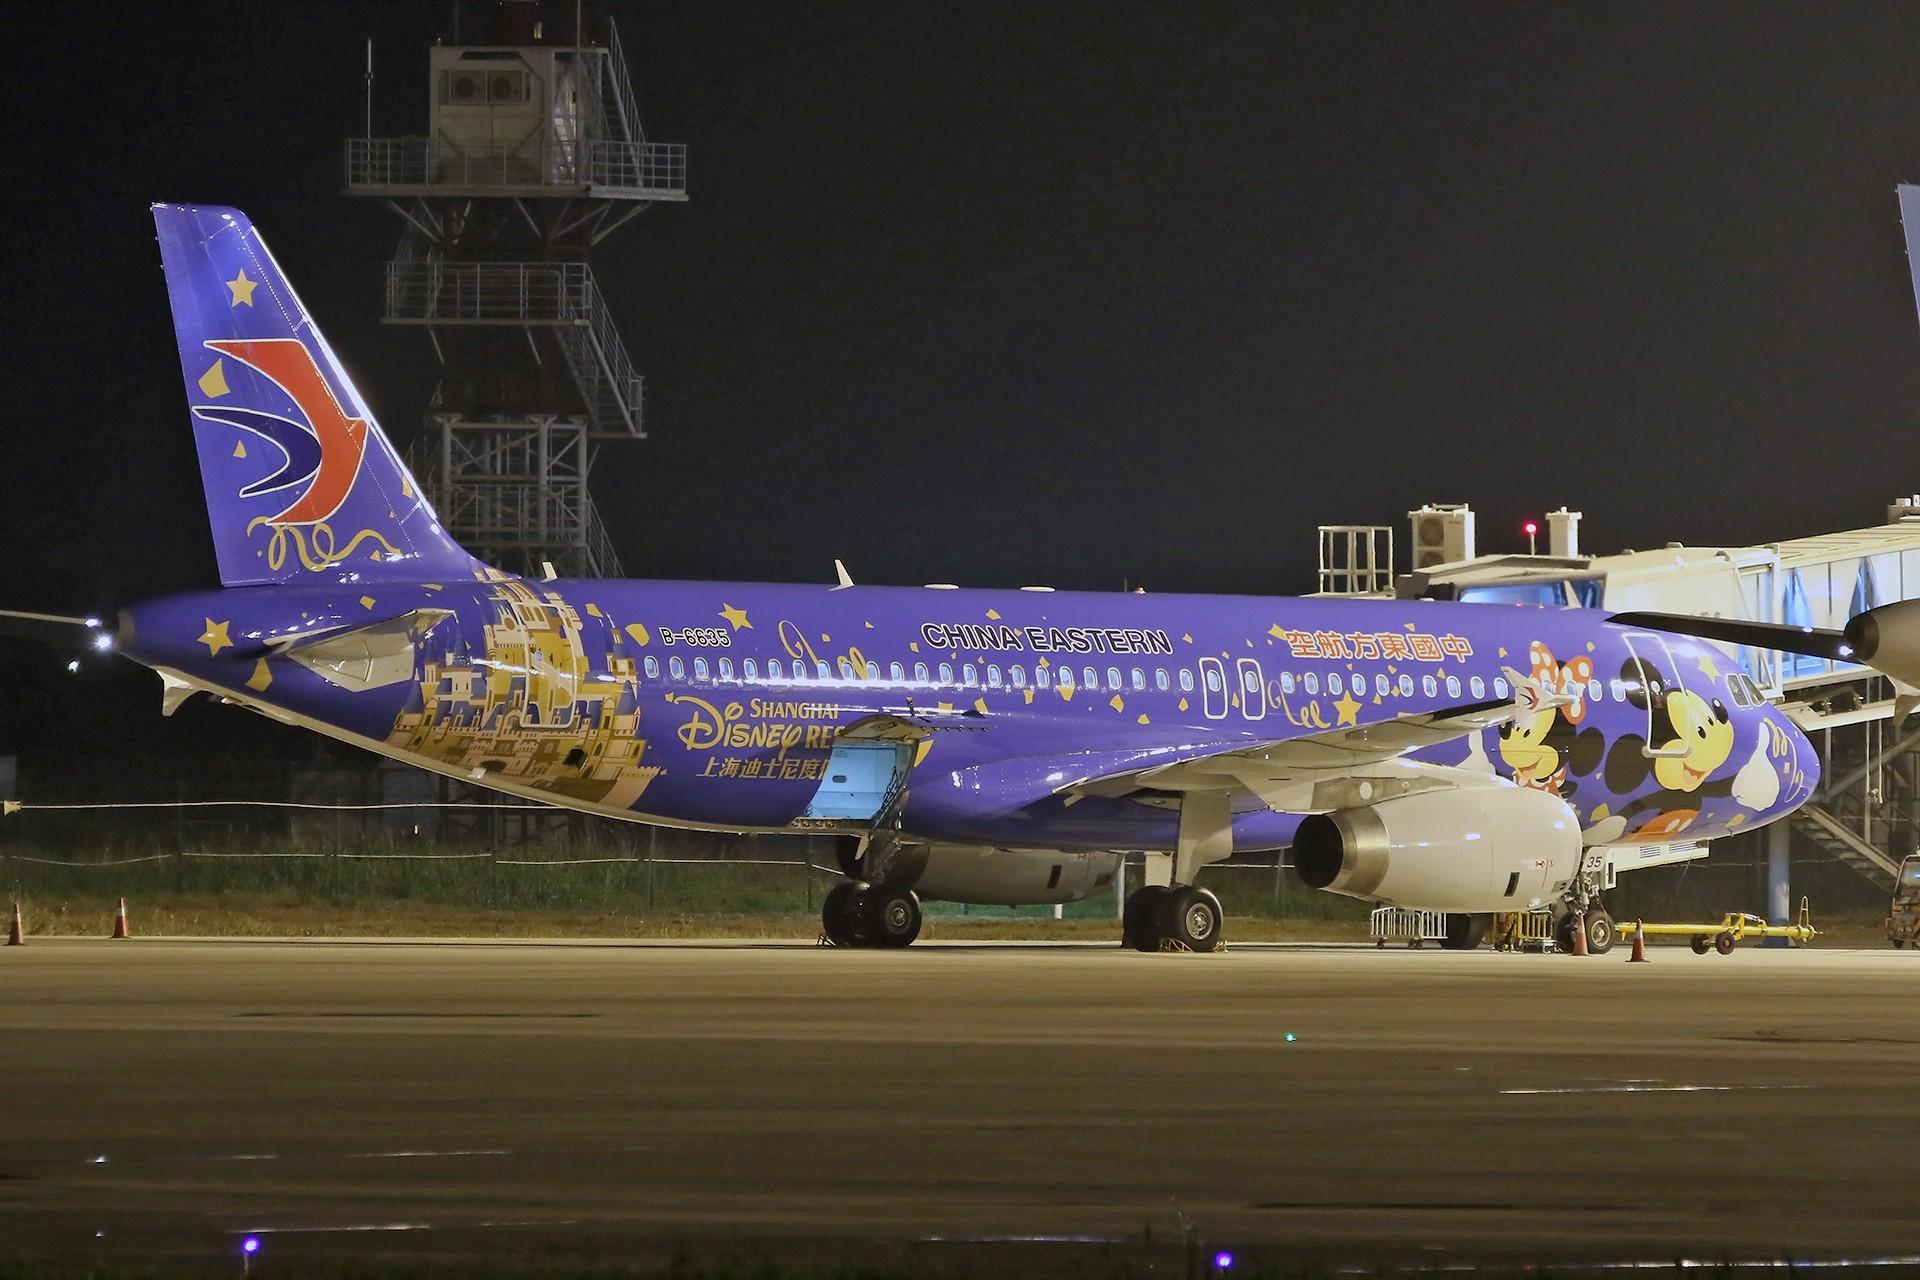 Re:[原创][合肥飞友会]霸都打鸡 找个机会白天打华航 顺便看看期待已久的迪斯尼 AIRBUS A320-200 B-6635 中国合肥新桥国际机场